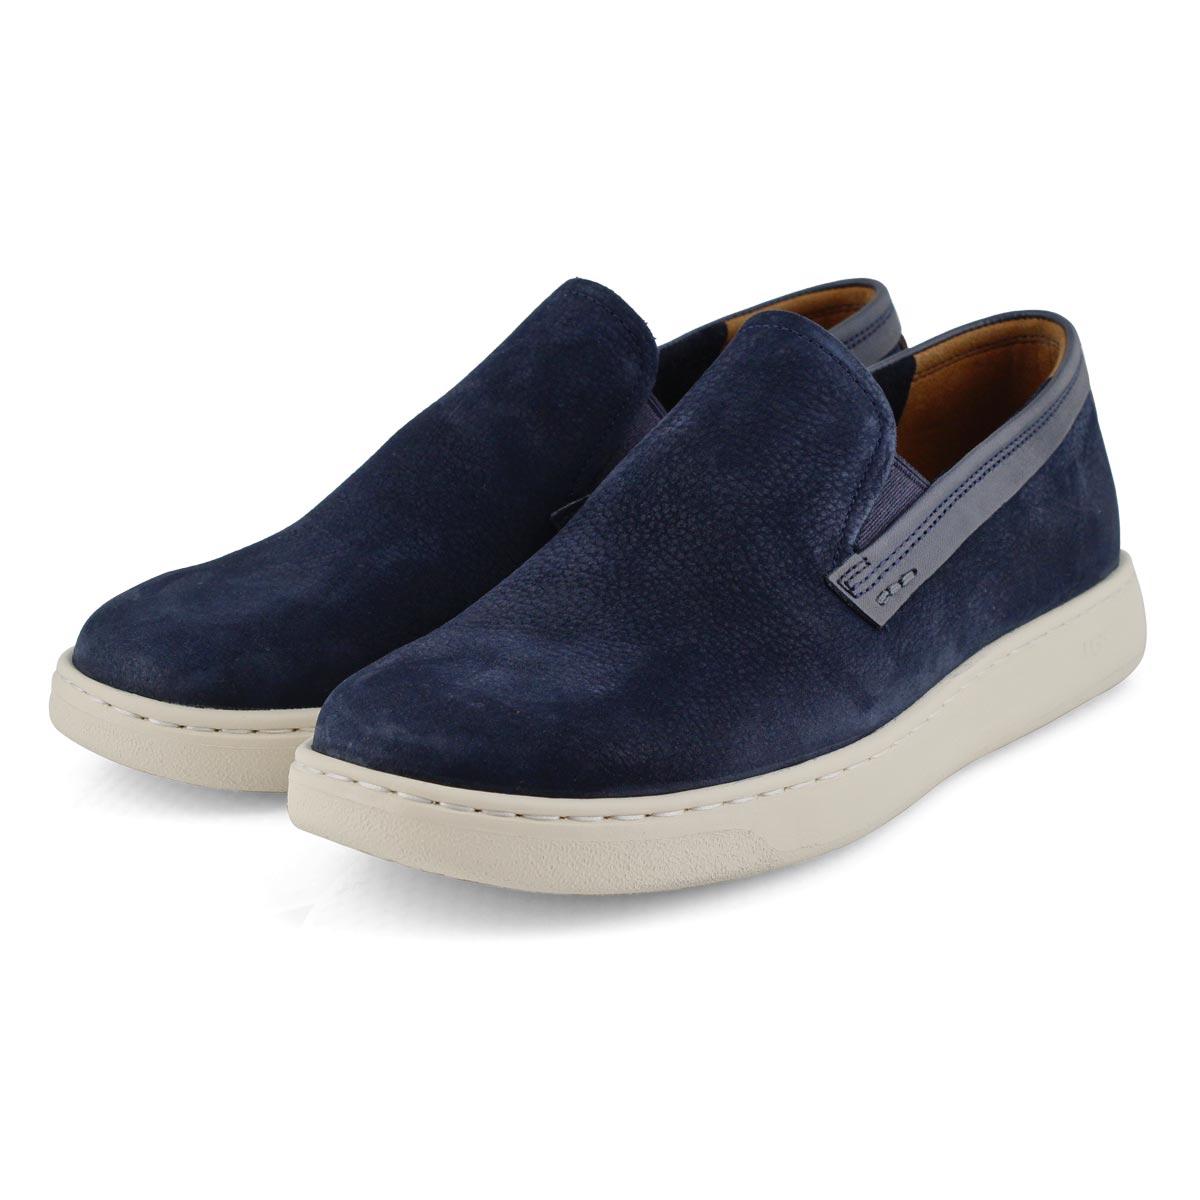 Mns Pismo dk sapphire slip on sneaker